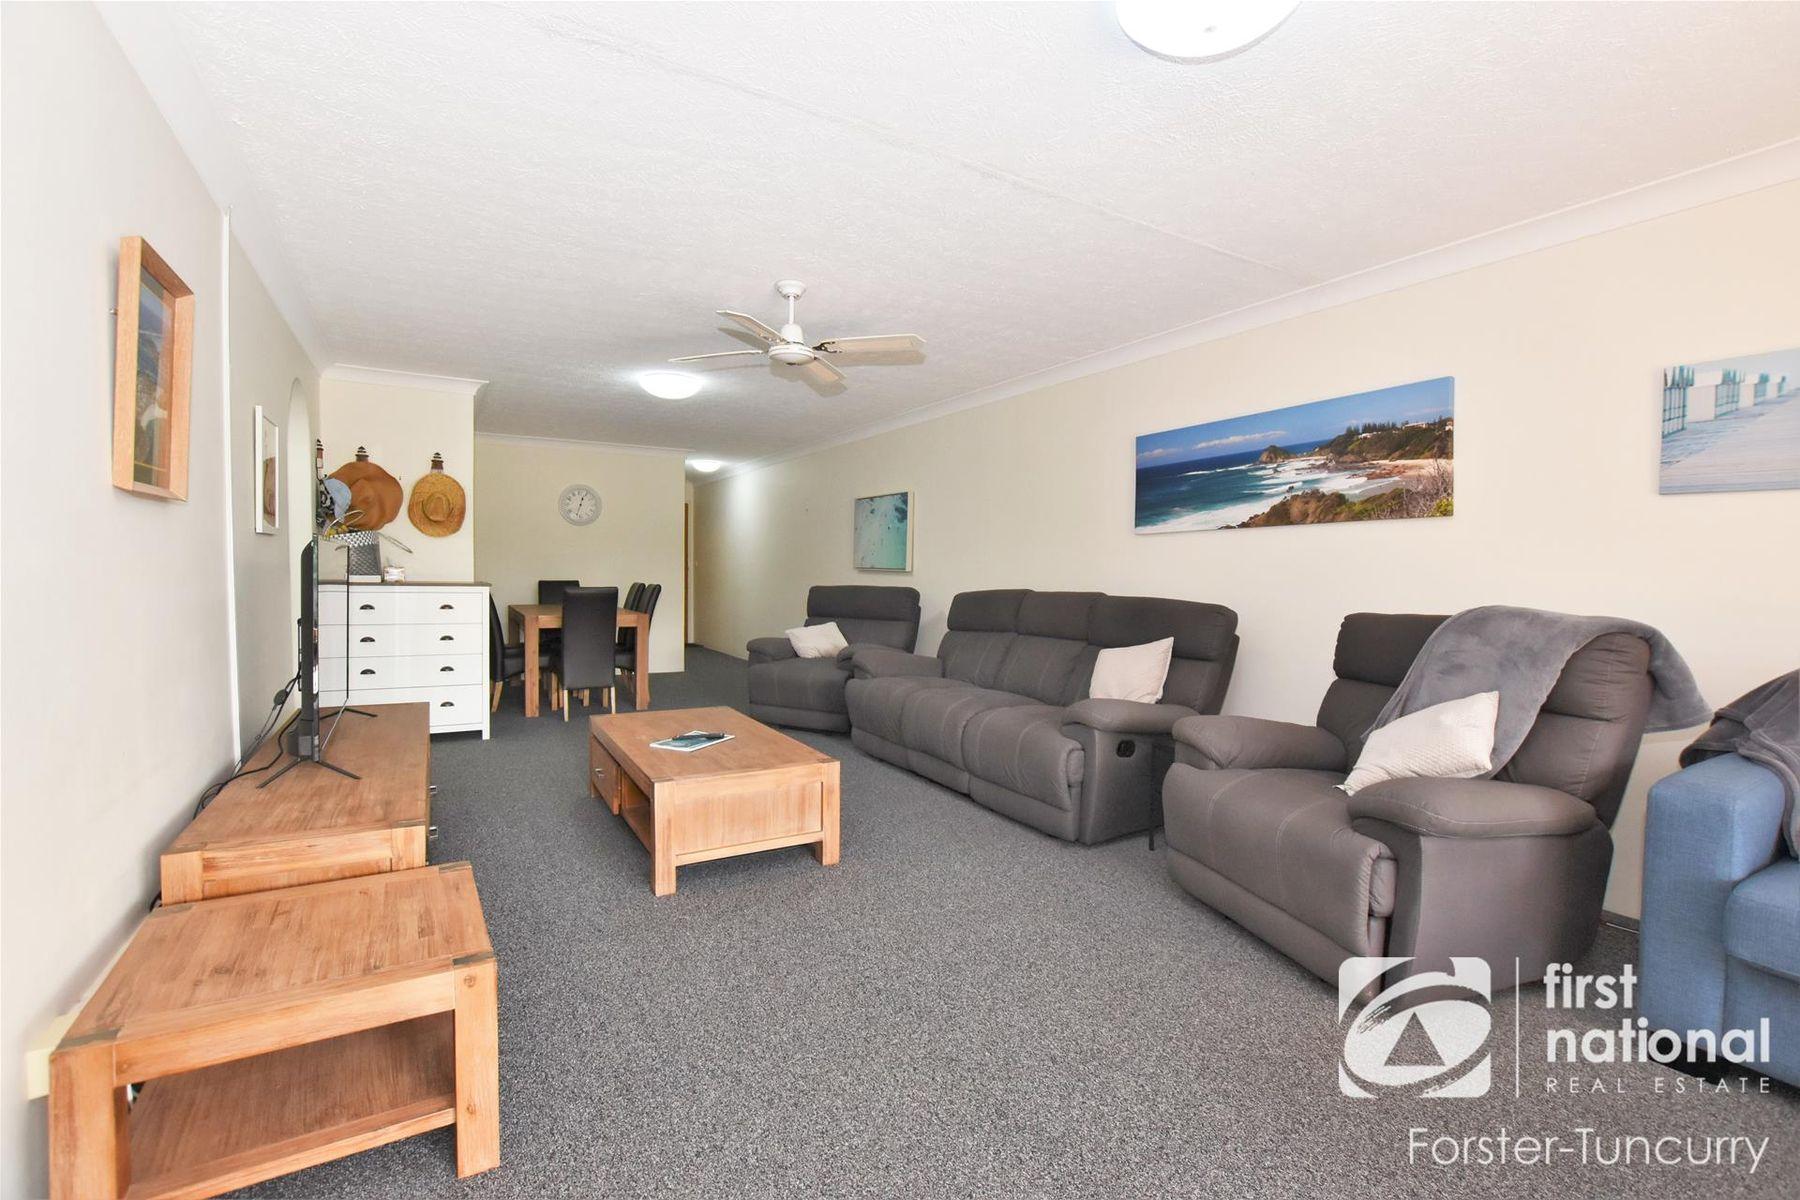 14/44-46 Wallis Street, Forster, NSW 2428